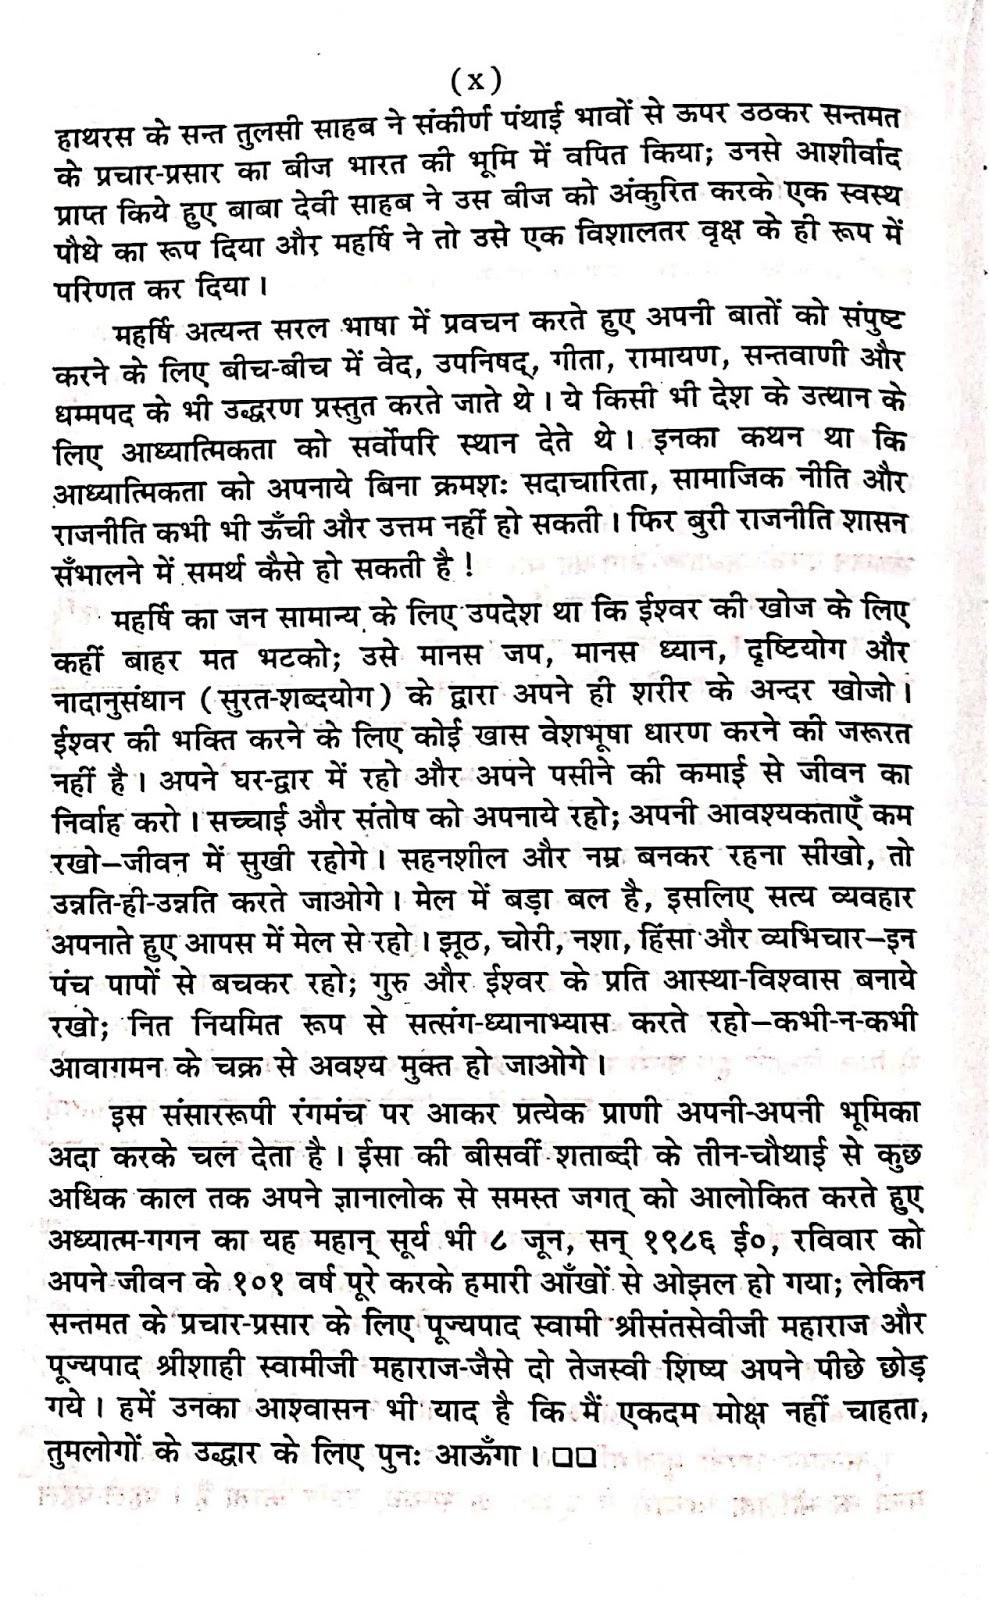 सद्गुरु महर्षि मेंहीं परमहंस जी महाराज एक परिचय Paramahansa ji is an introduction to Sadguru Maharshi। महर्षि मेंहीं परिचय चित्र समाप्त